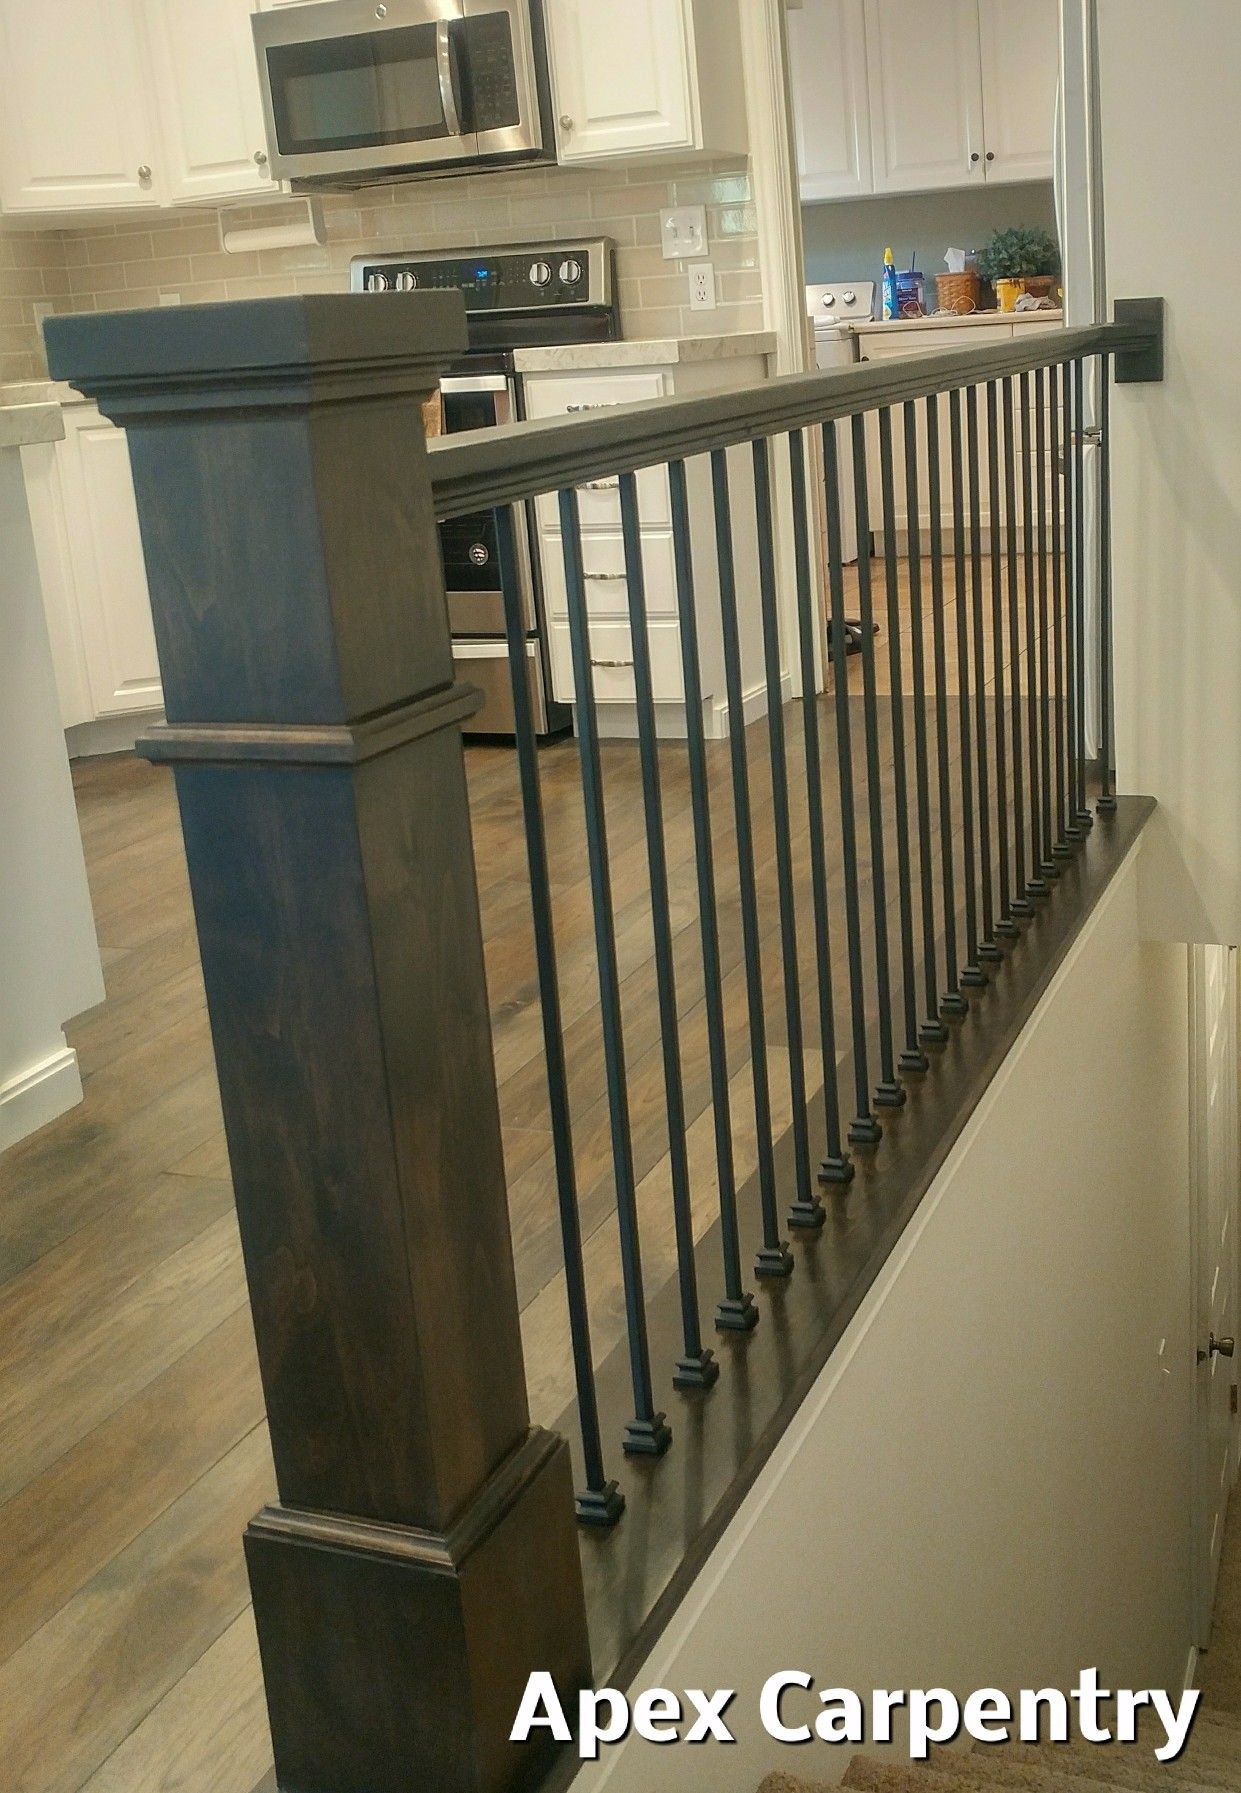 Orem Utah Stair Rail With An Alder Post And Plain Iron